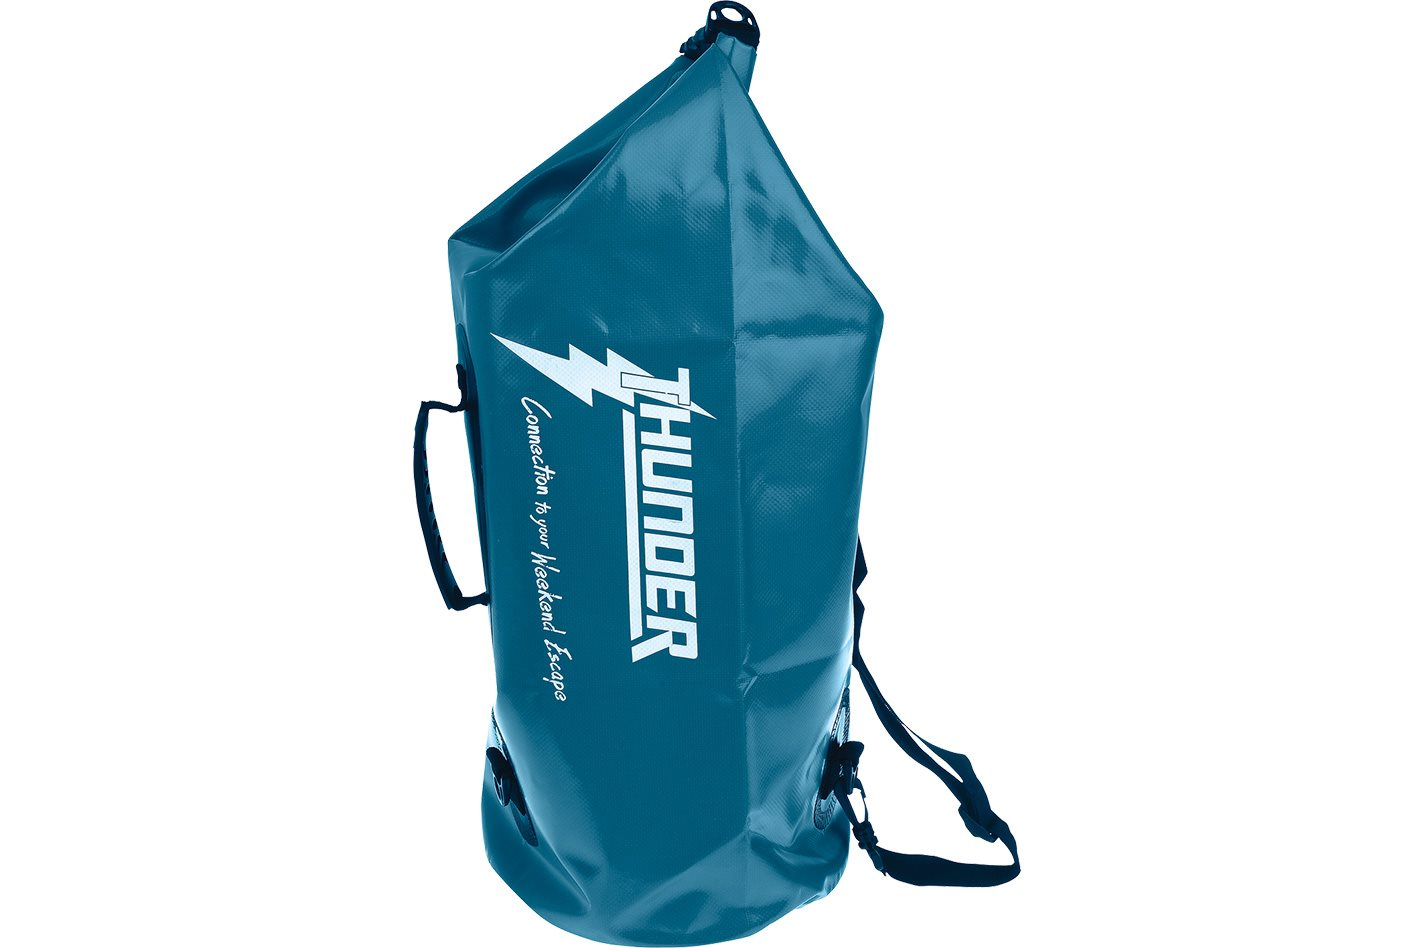 Thunder Auto Dry Bag